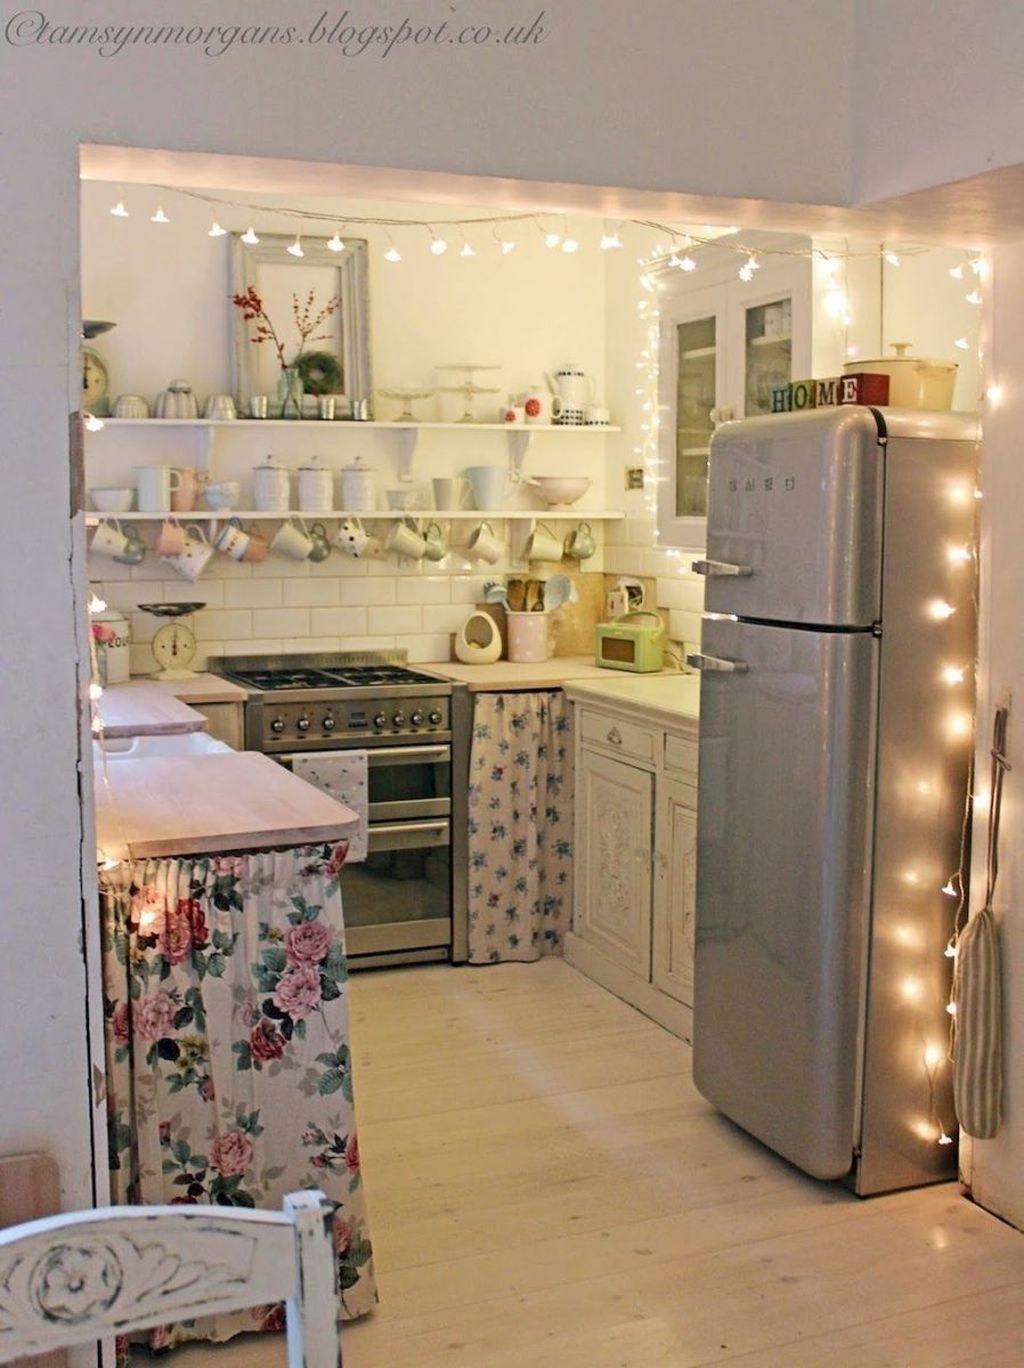 20 stunning small kitchen design ideas for home kitchen cozy rh pinterest com